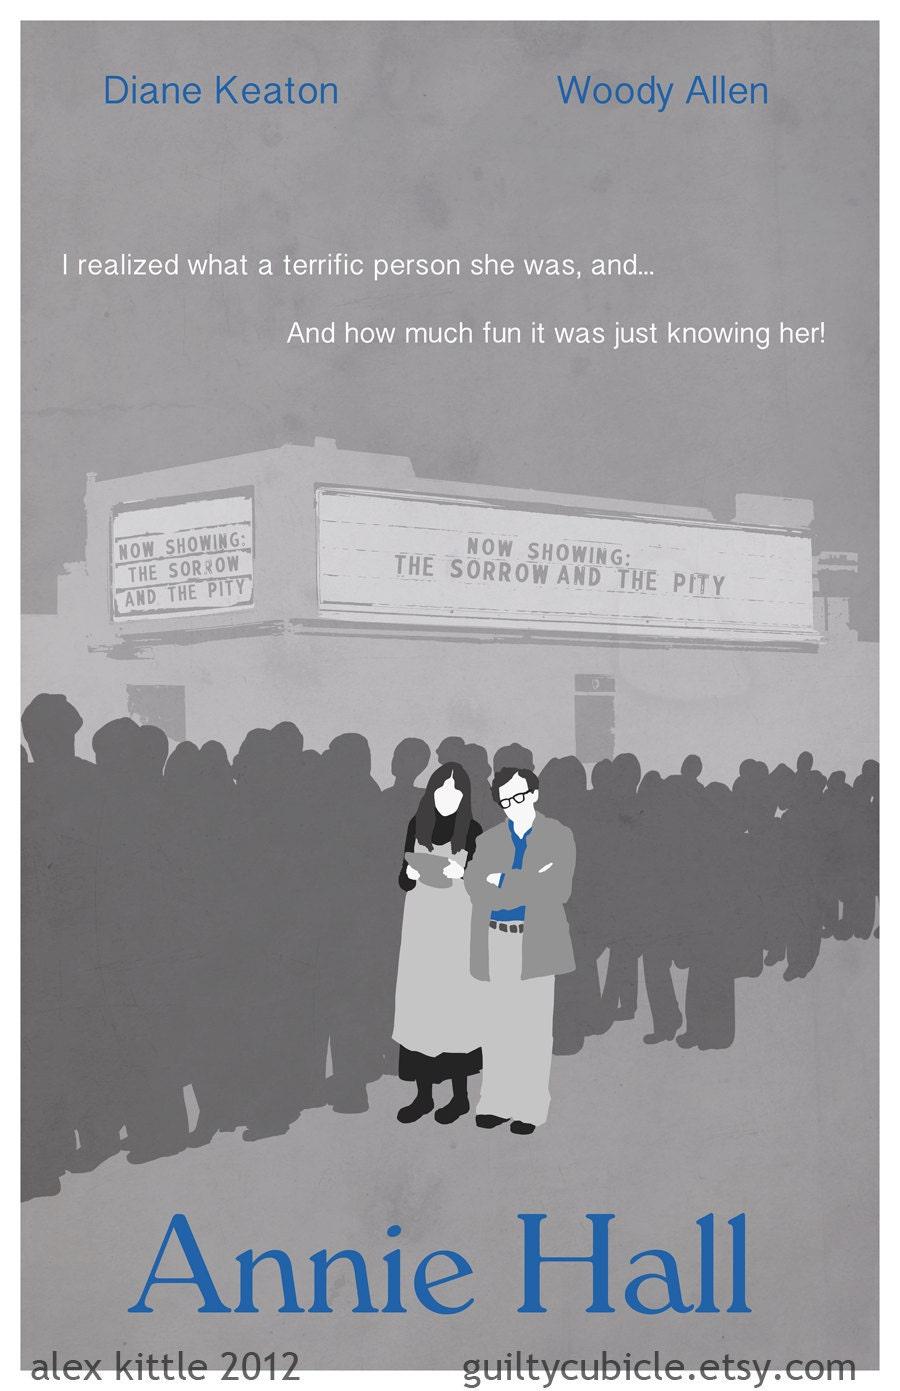 annie hall poster - photo #7